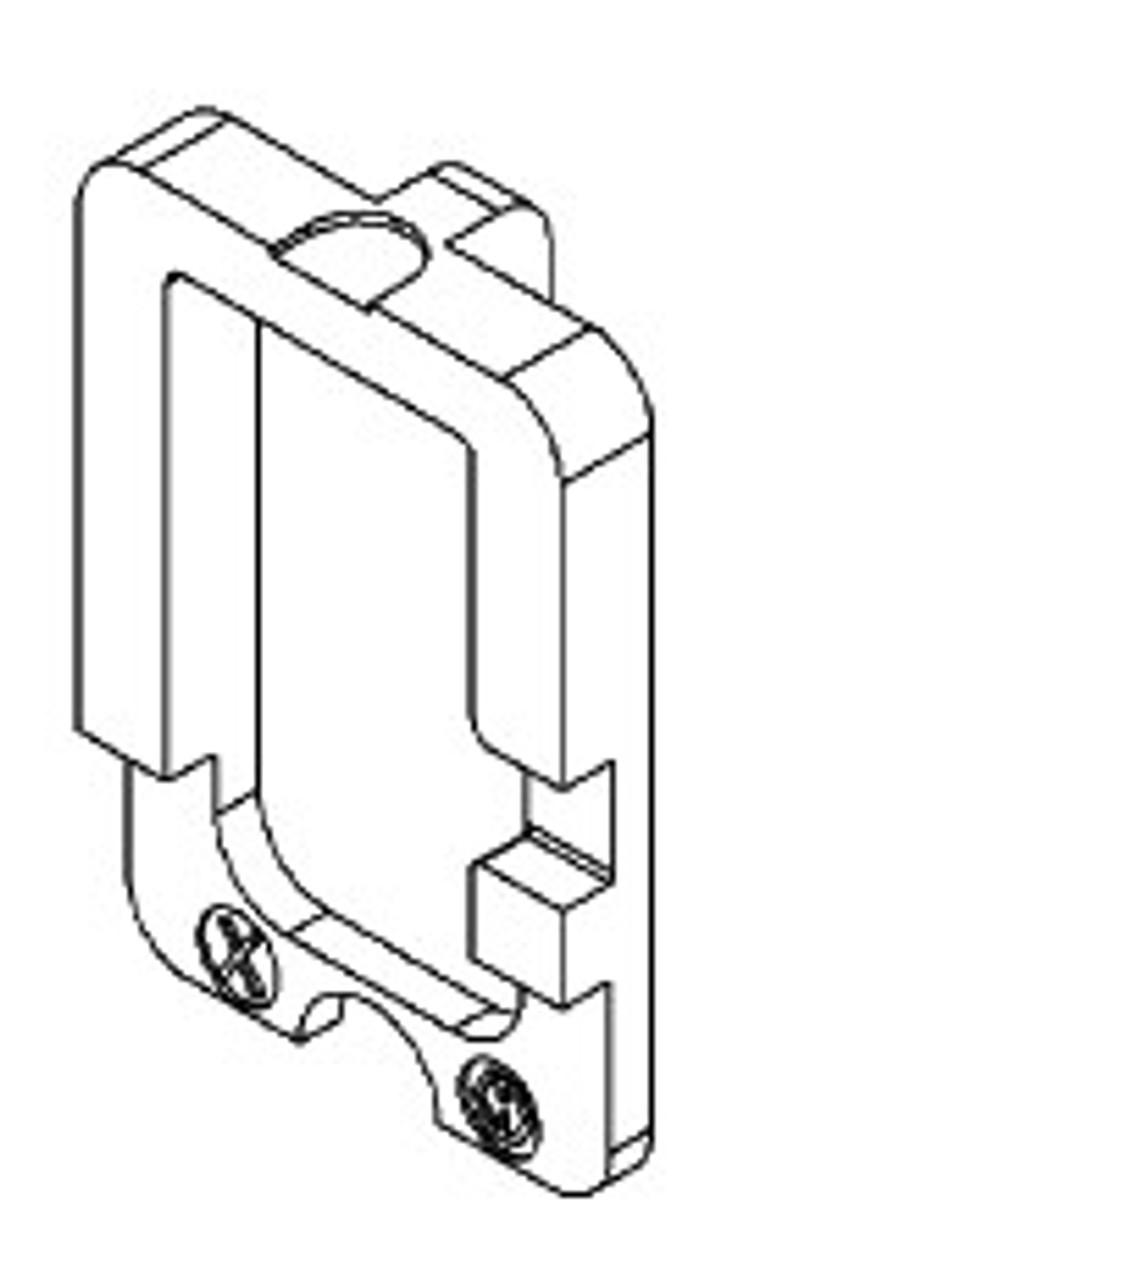 Pack of (2) Hoppe HFW Z SCHIEBER DREHWANDLER  for 7 series handle set 2005091